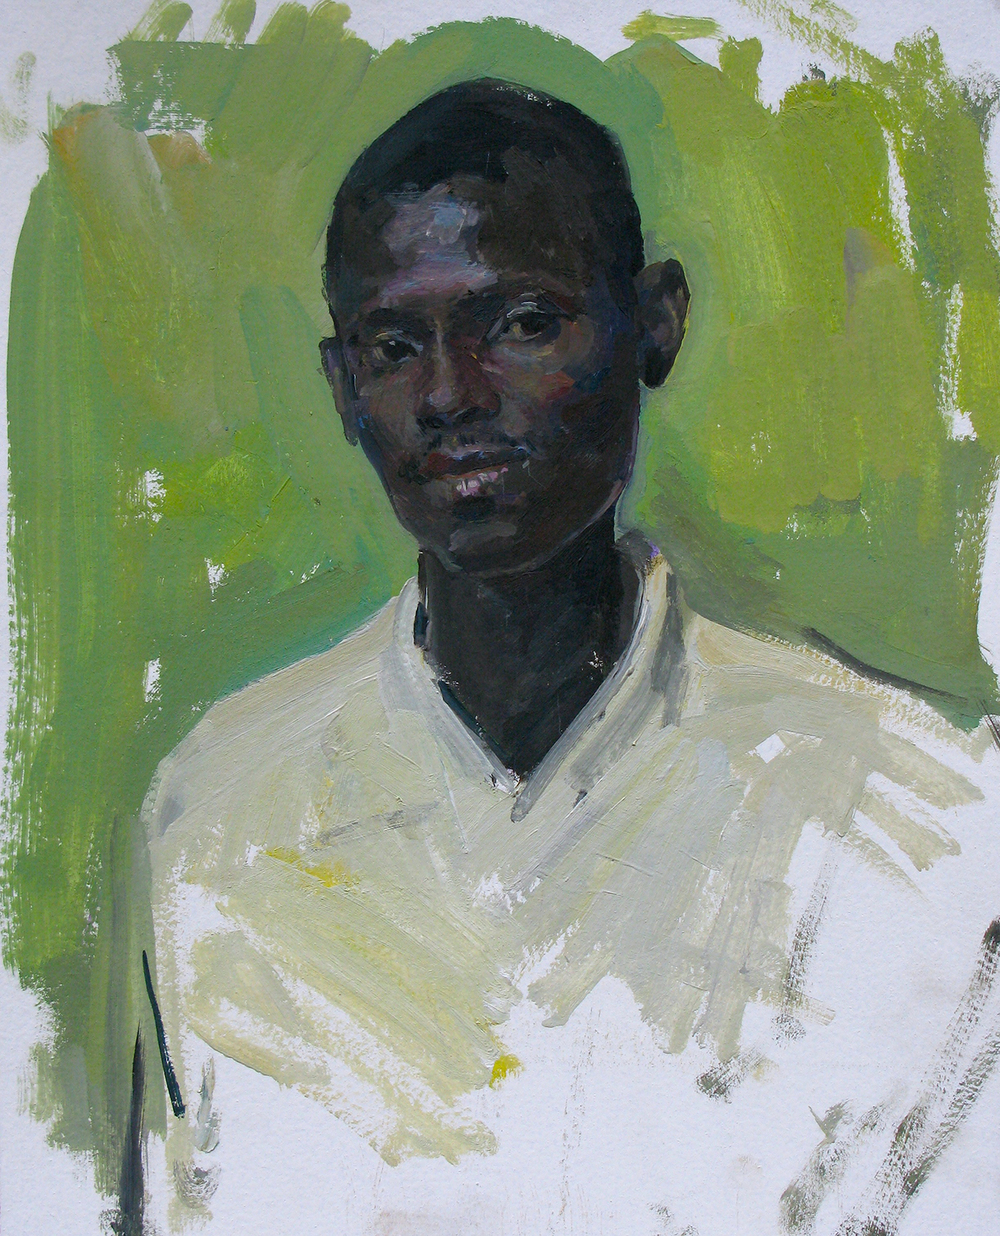 Iliya Mirochnik, Portrait Study 1.jpg